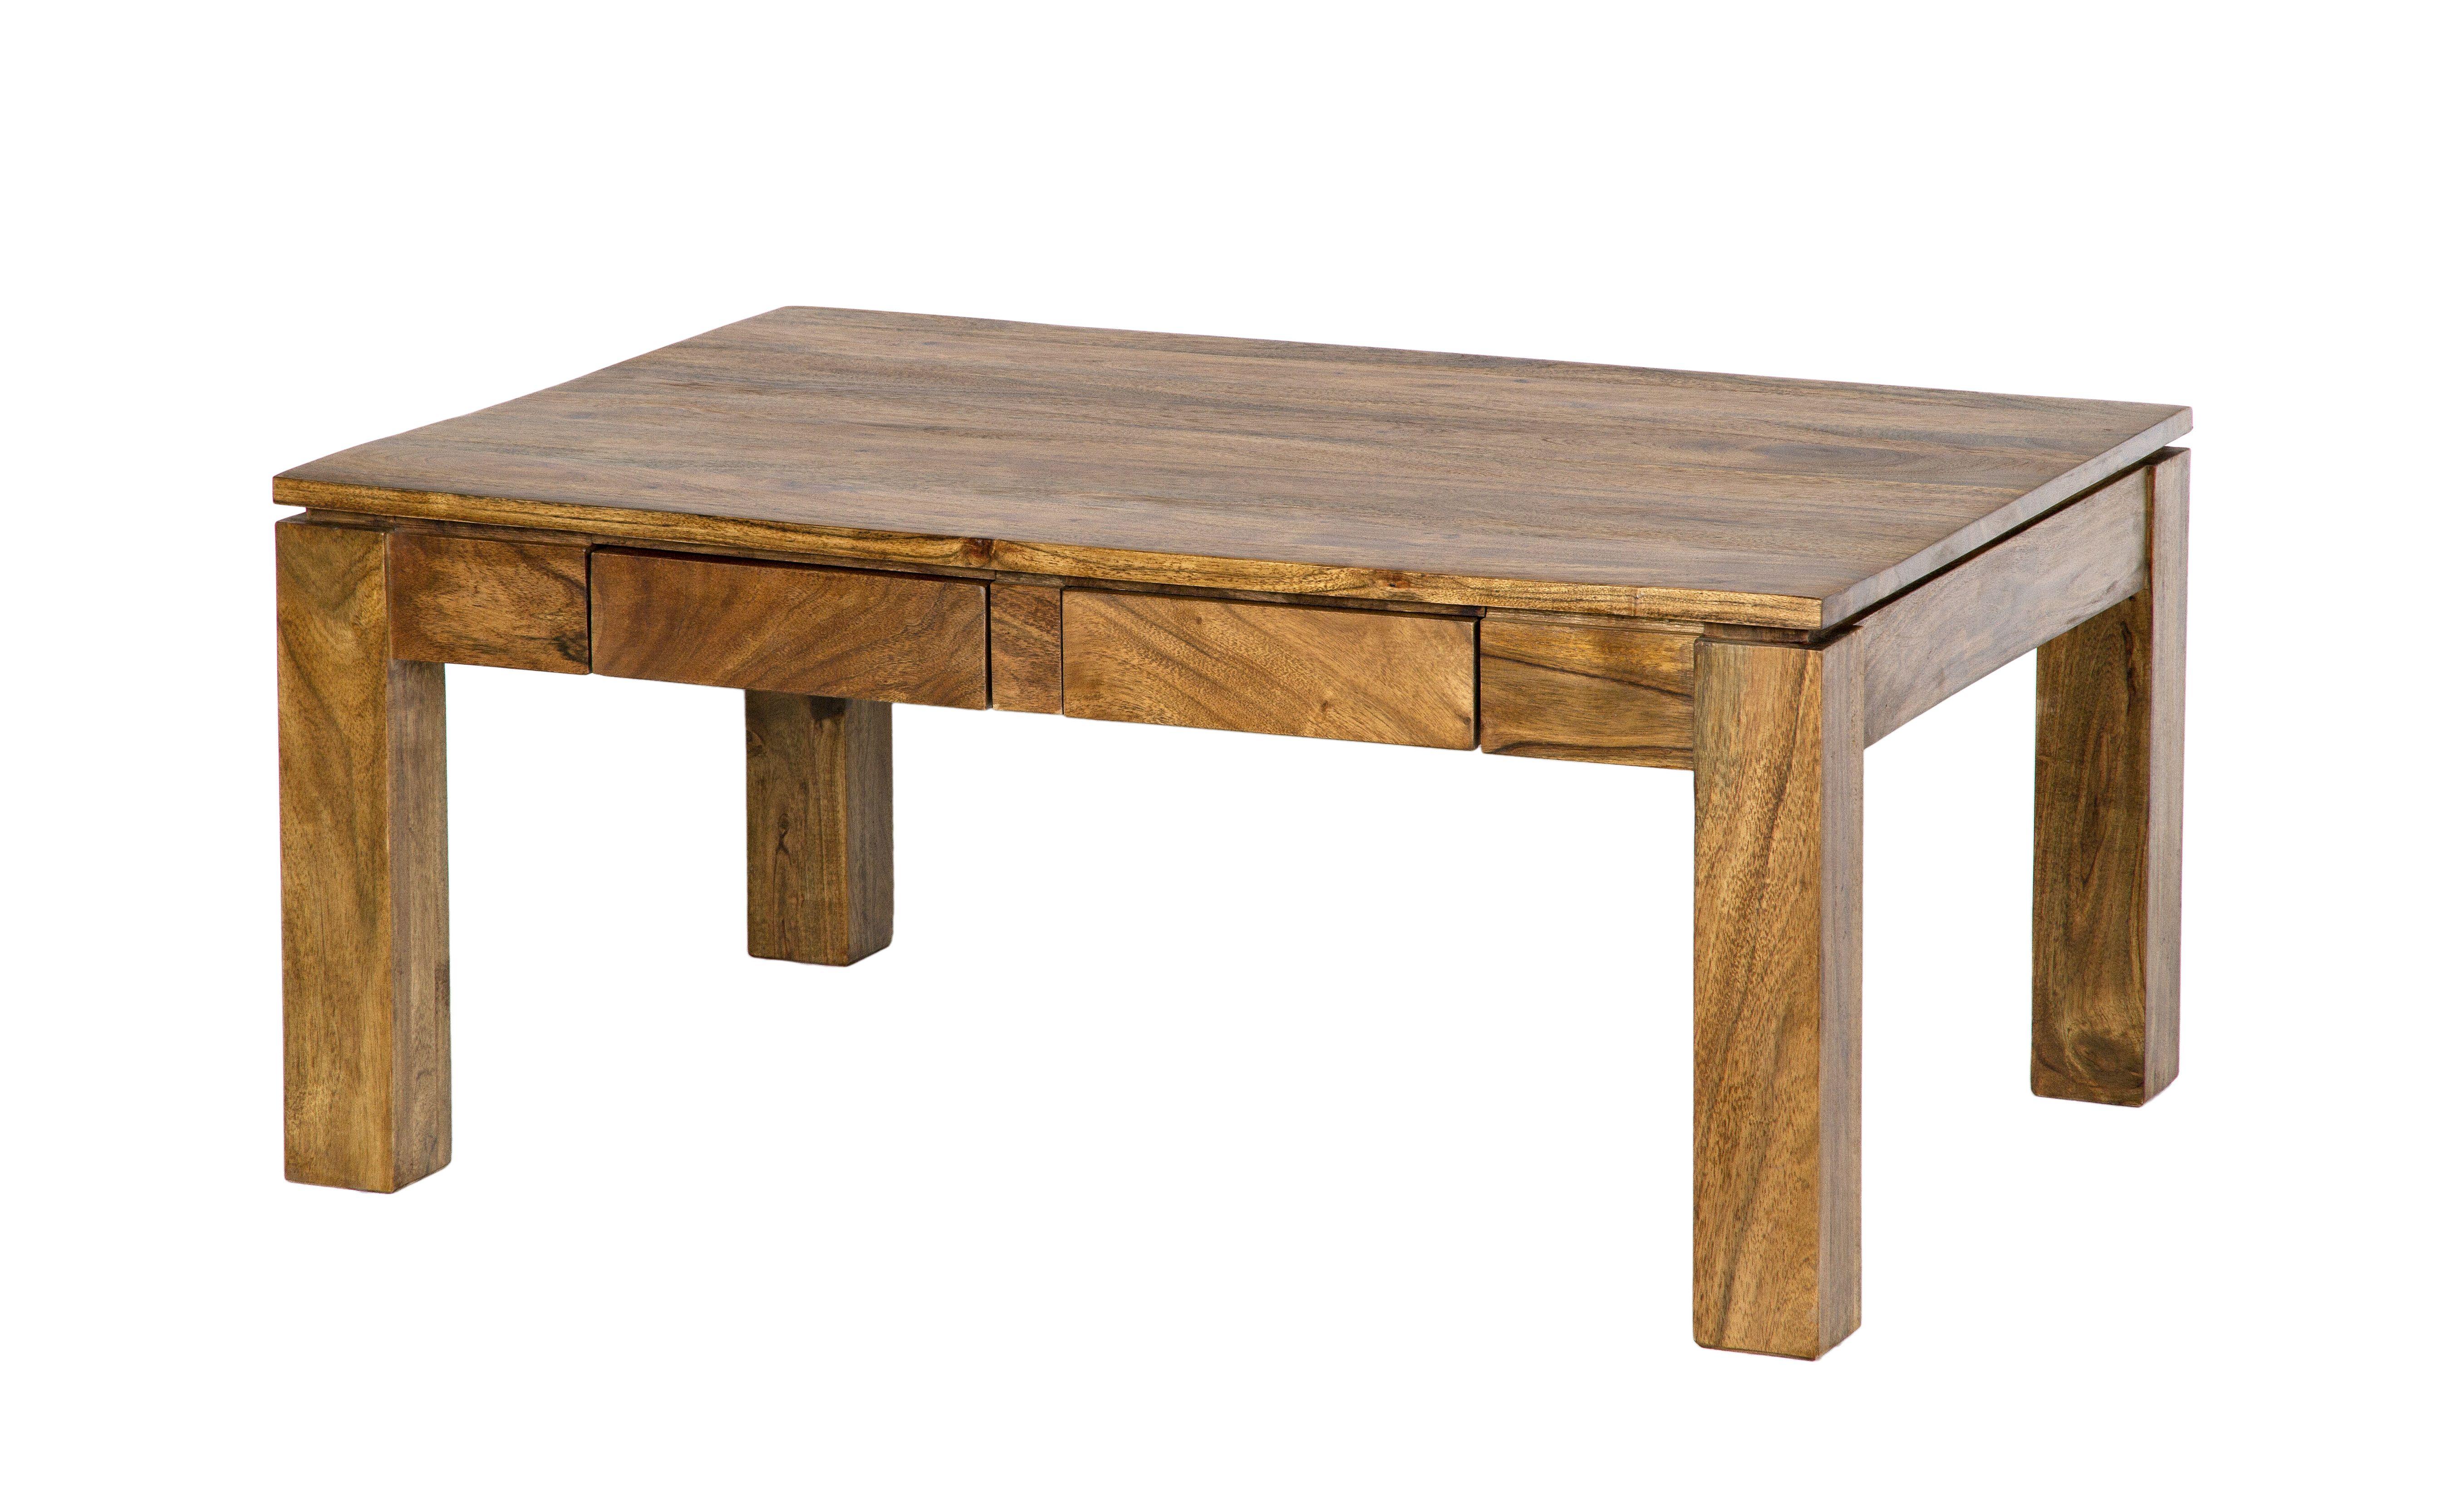 design de qualité 4d7c7 17bd4 Table basse 2 tiroirs Acacia massif miel 90x65x40cm BOREAL ...